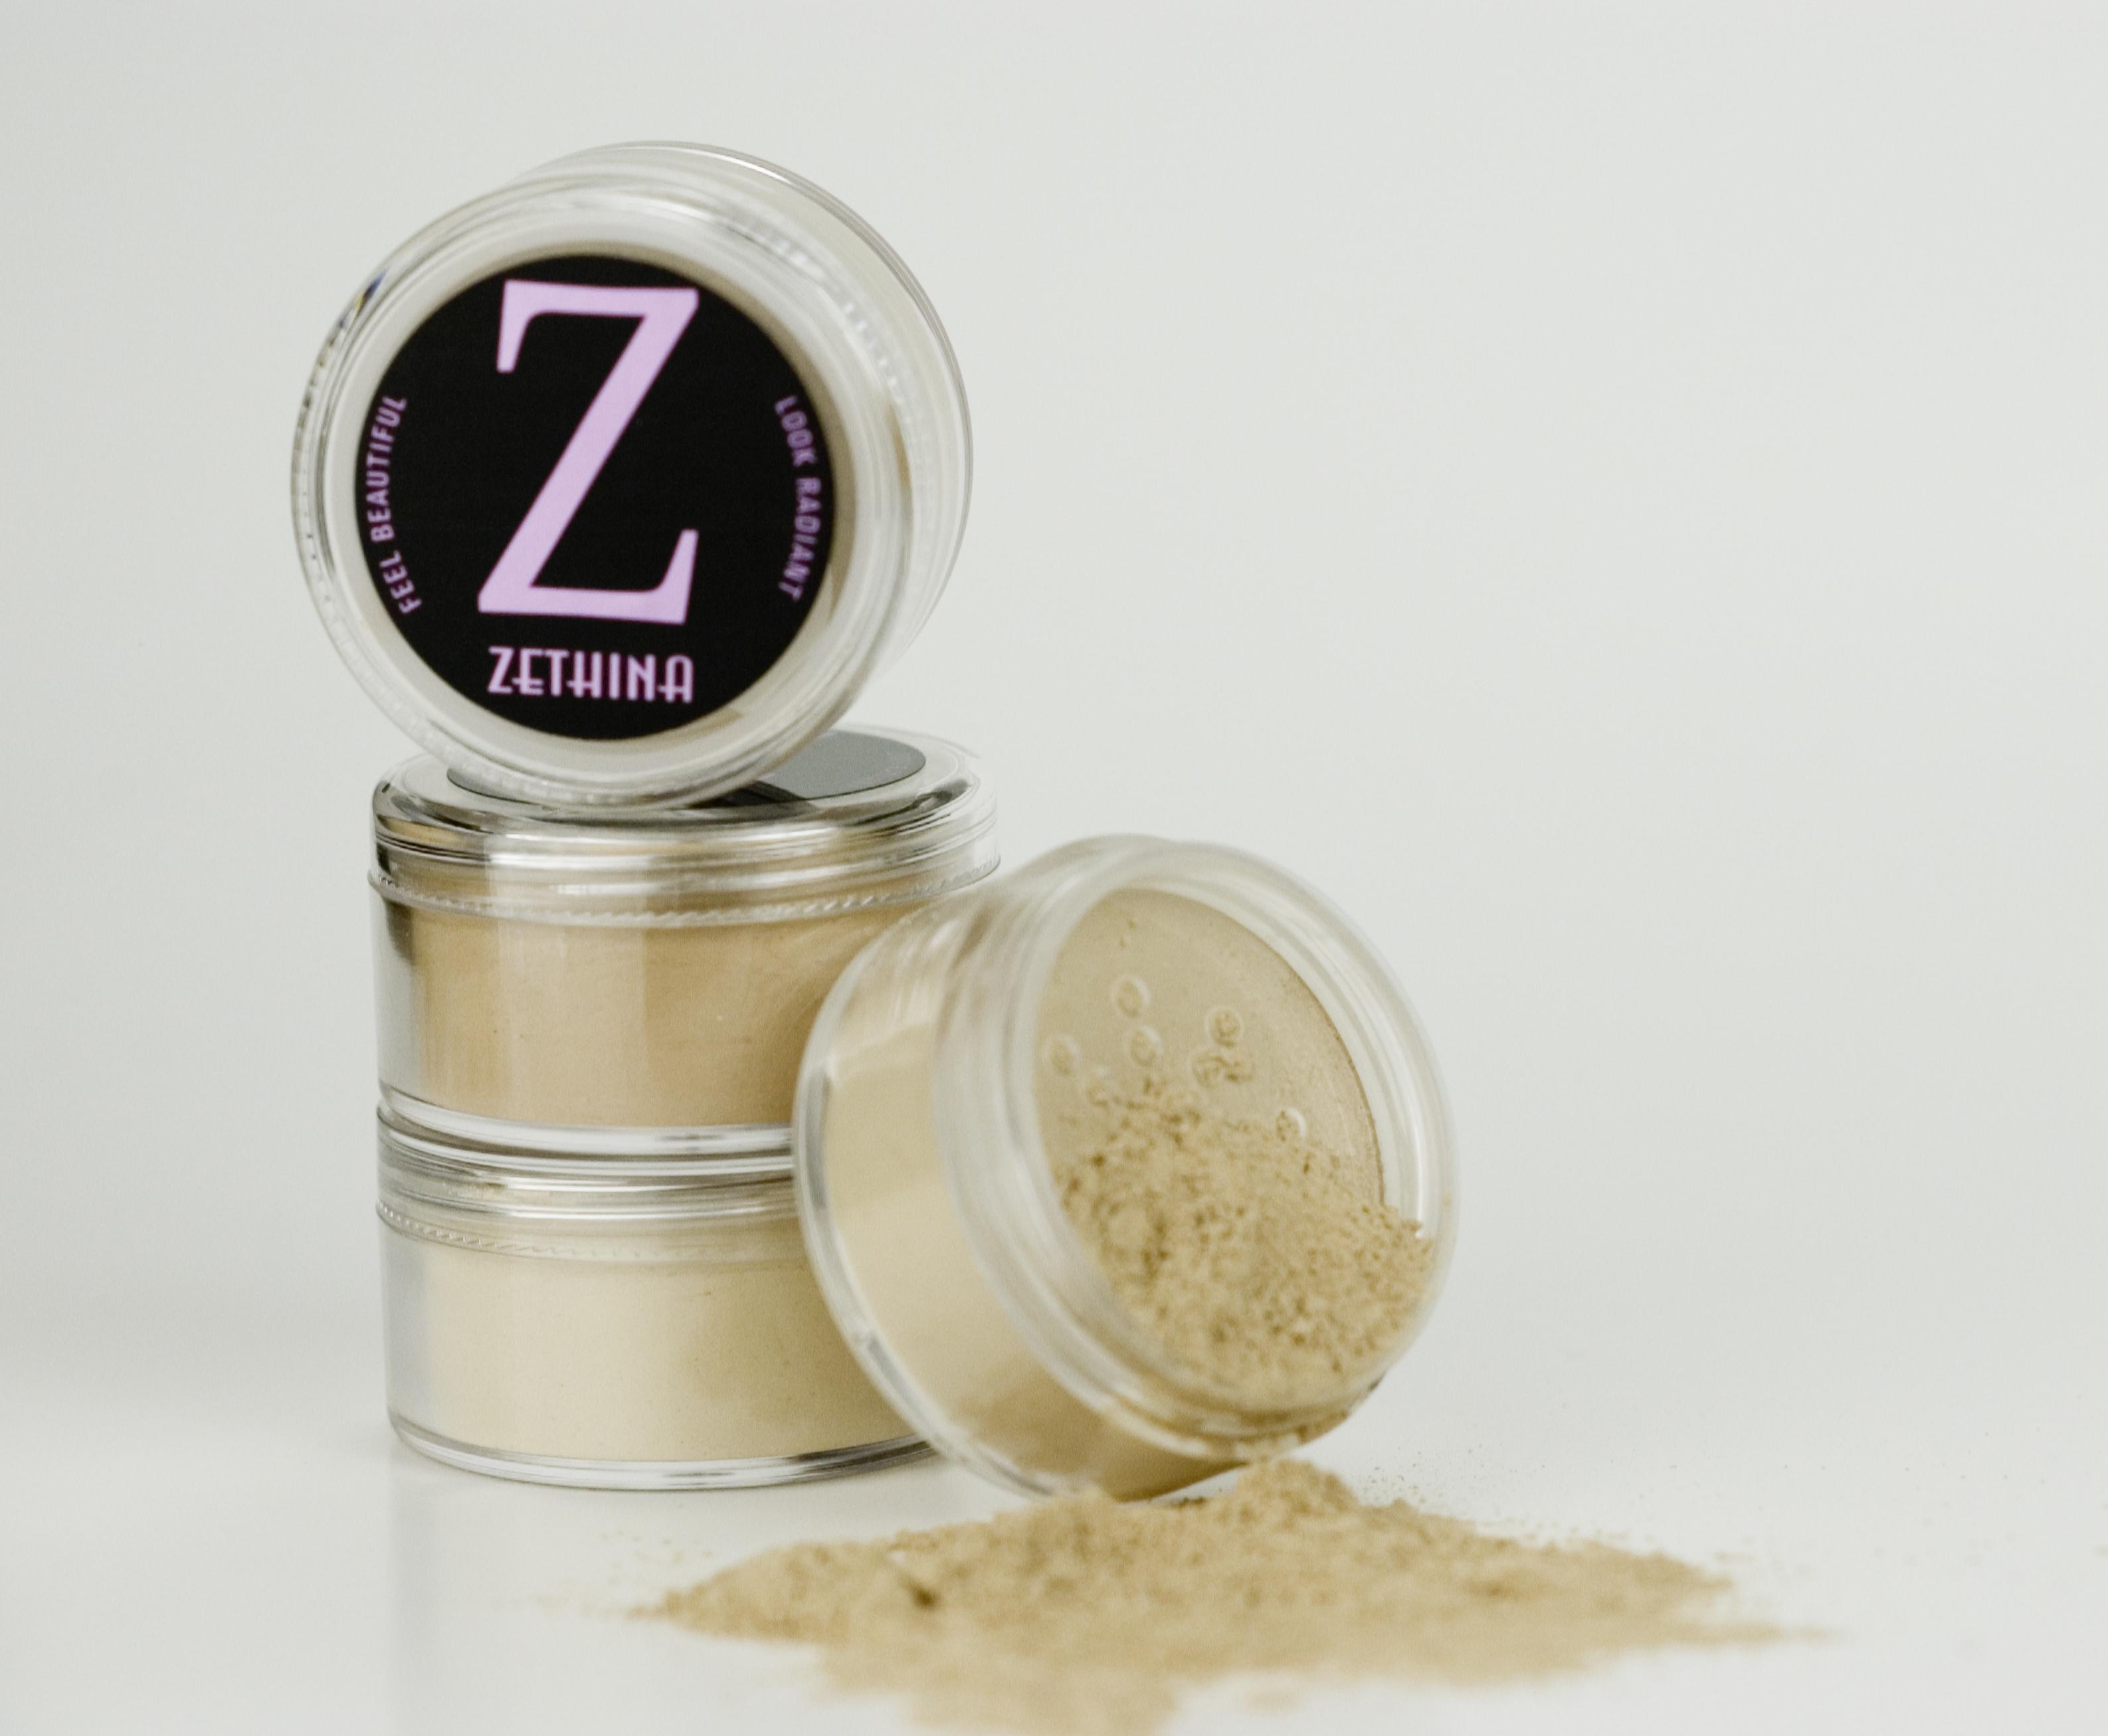 Zethina Mineral Makeup